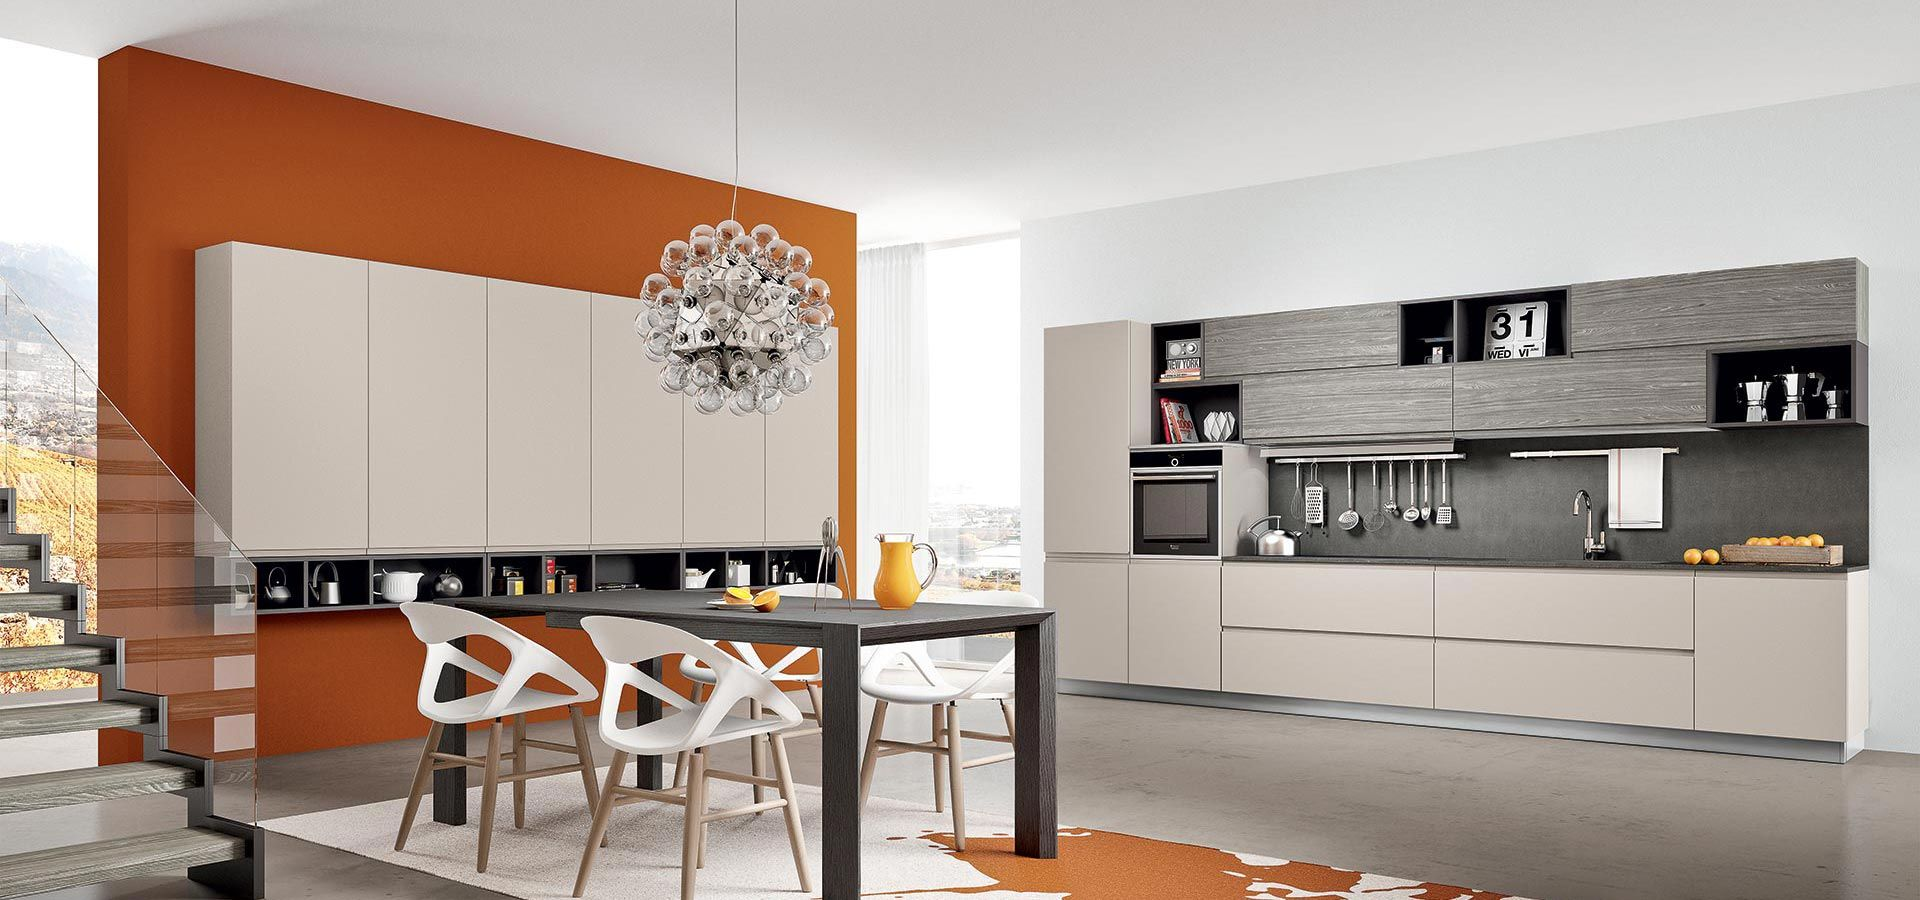 Cucina Moderna - Wega Finitura laccato ecrù opaco e laminato pino ...